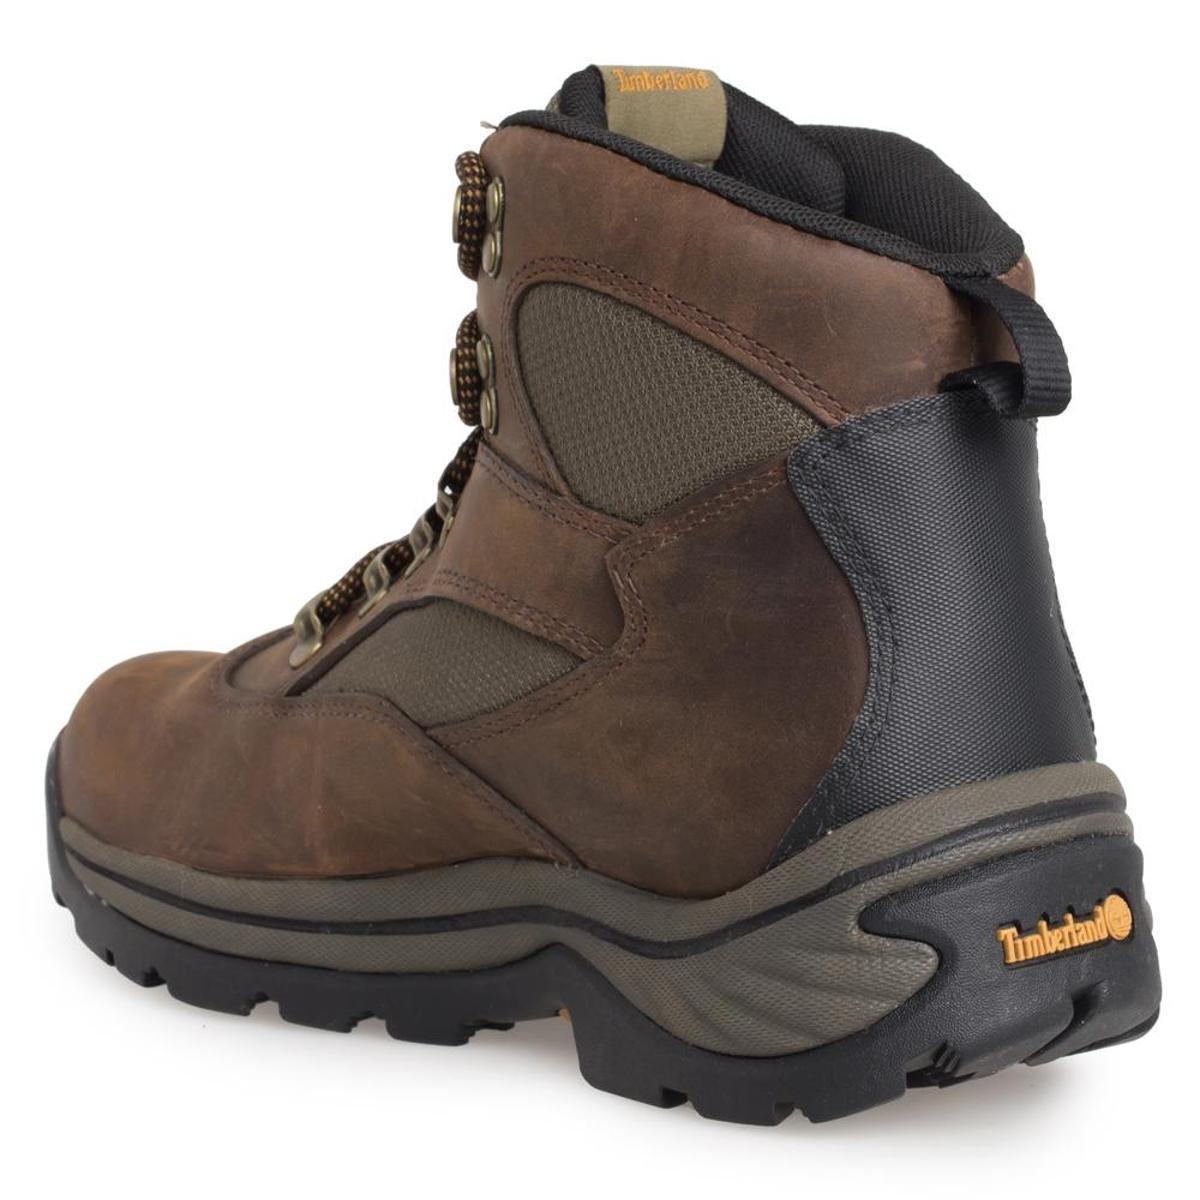 Bota Timberland Chocorua Trail Mid Gtx Masculina - Compre Agora ... b38a0a651a1